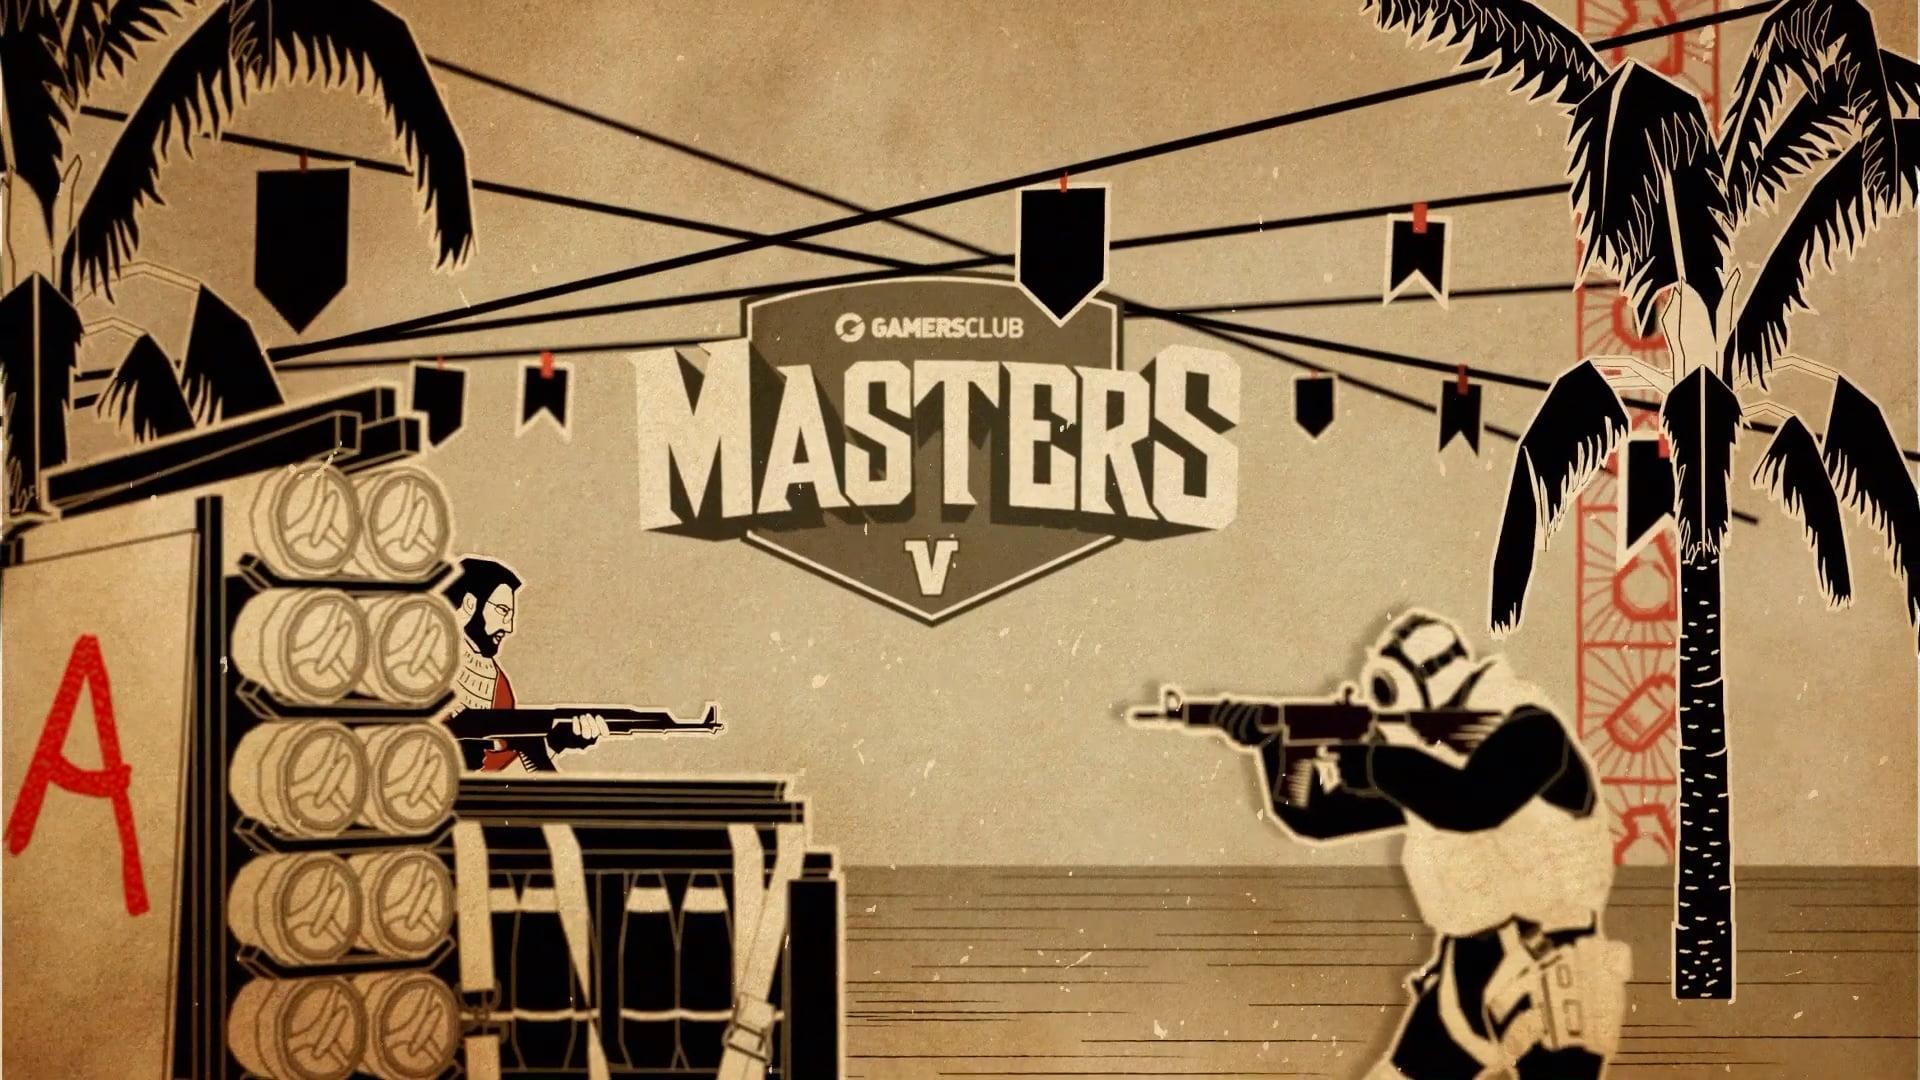 GC Masters V